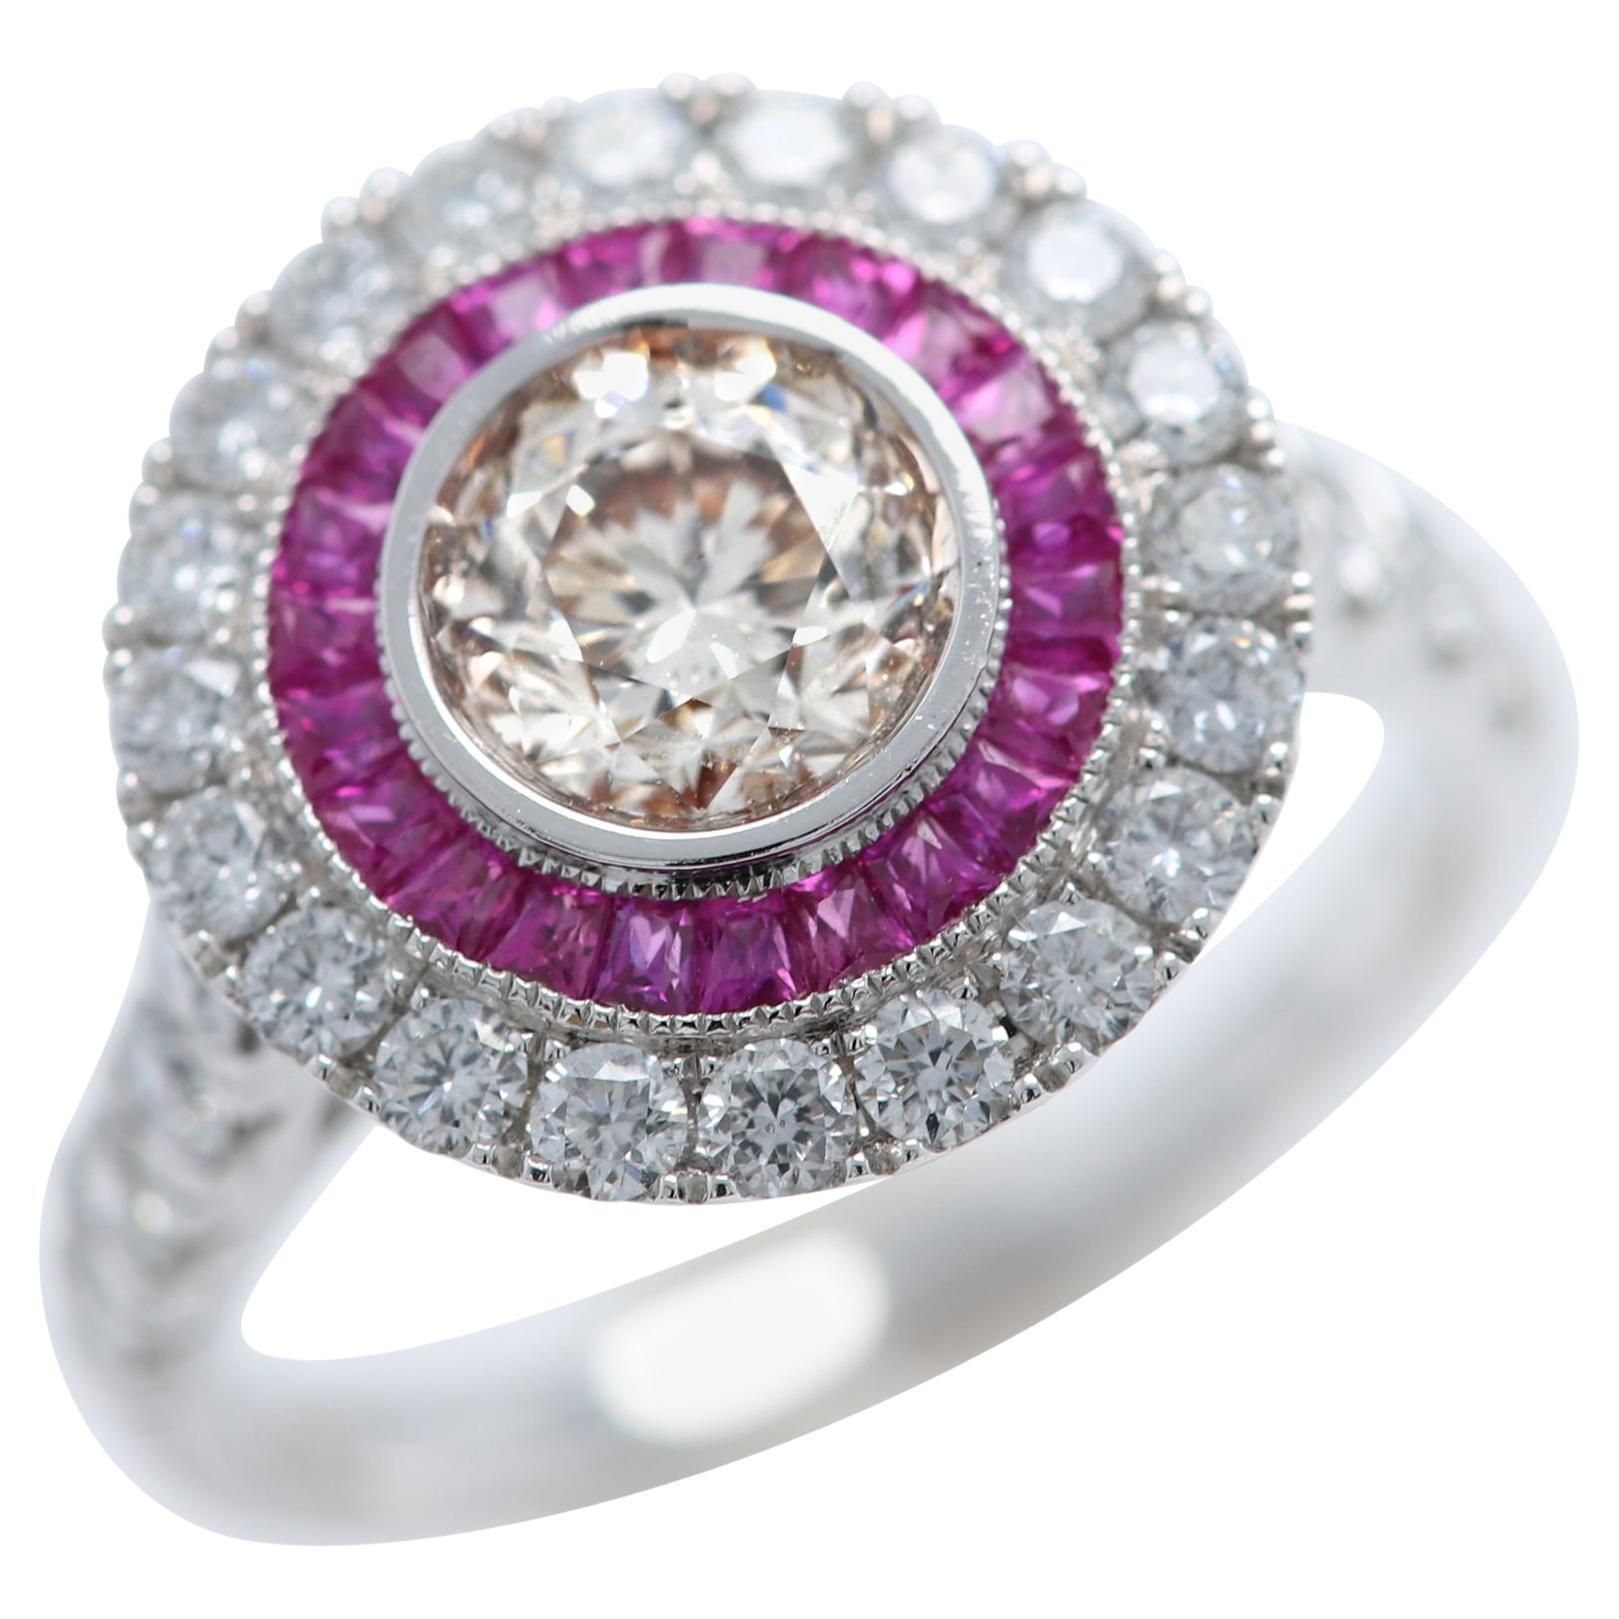 Art Deco Style Ring Ruby and Diamonds 18 Karat White Gold